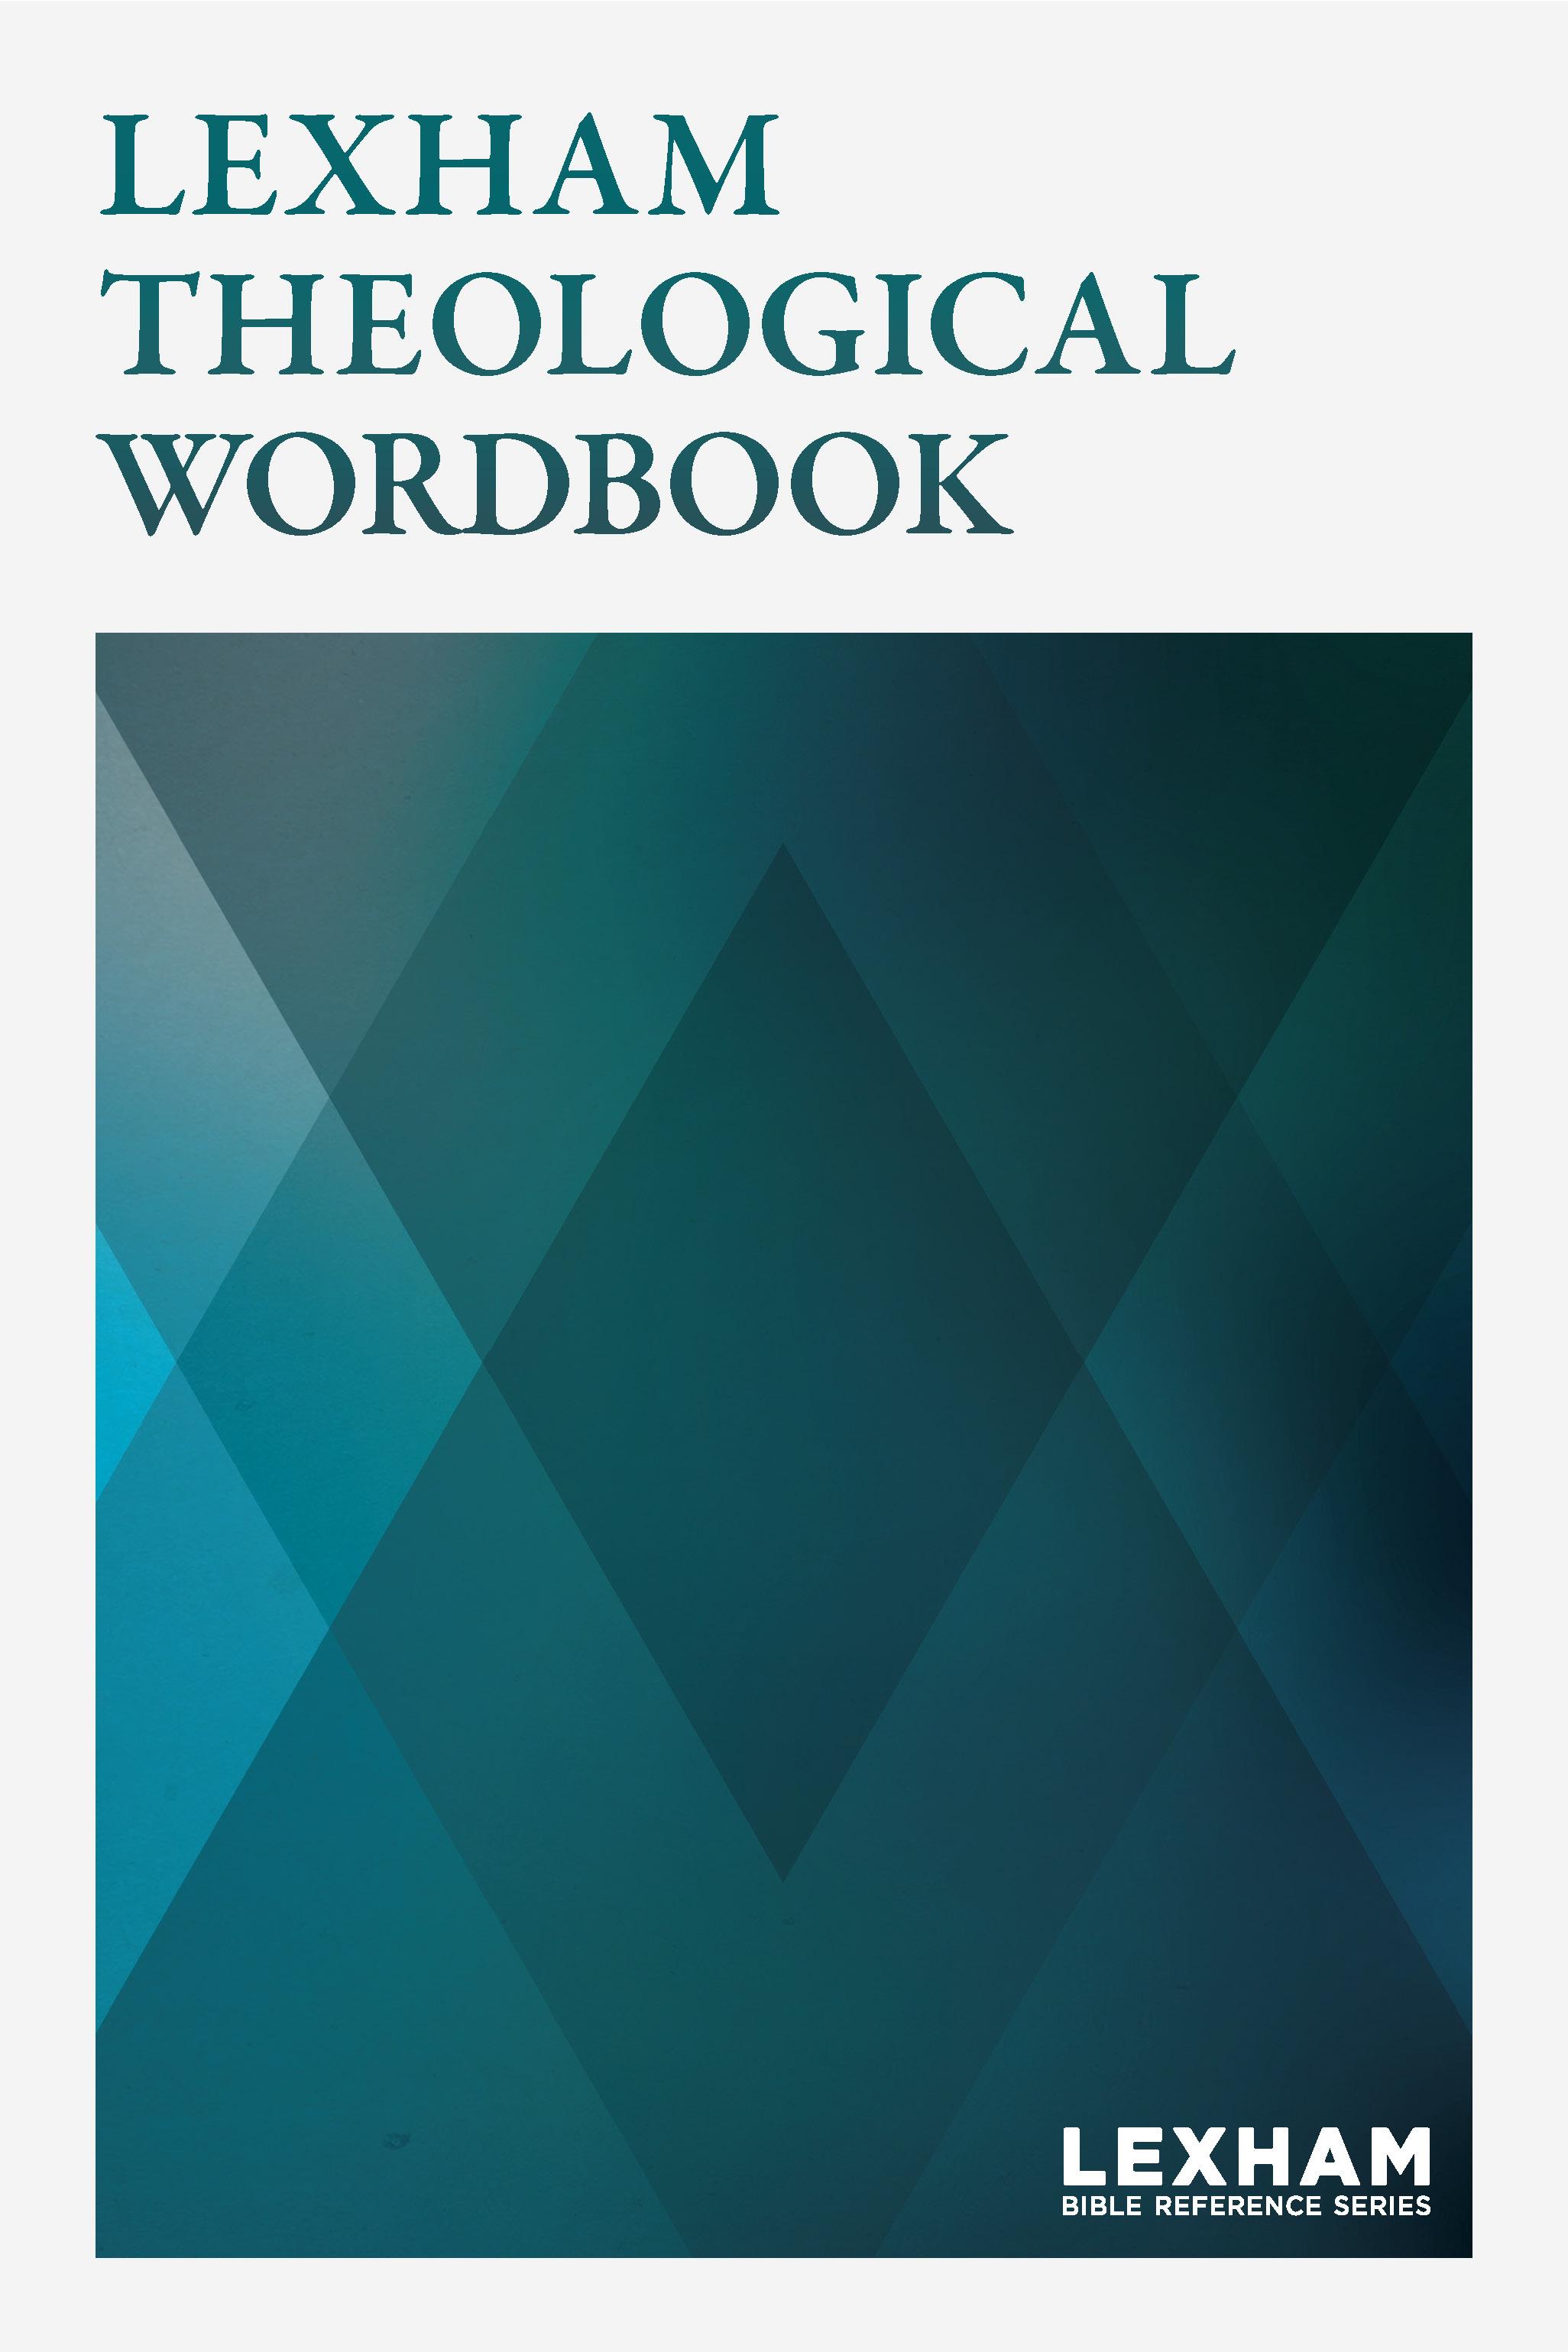 Lexham Theological Wordbook